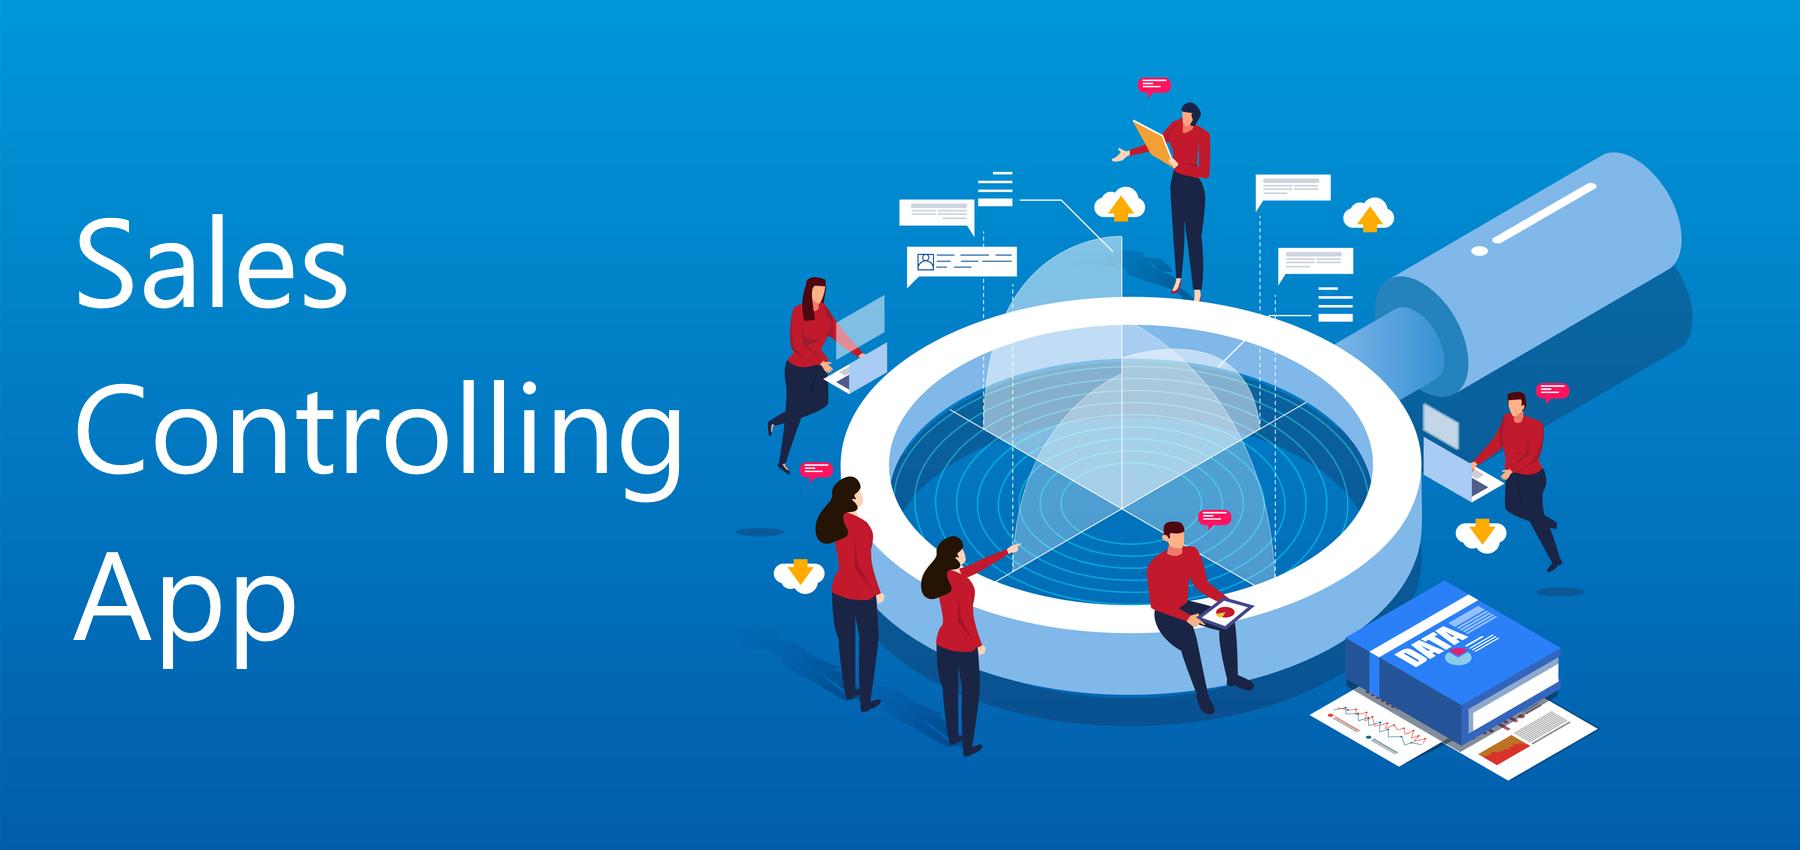 Sales Controlling App logo - EMARK Sales Controlling App